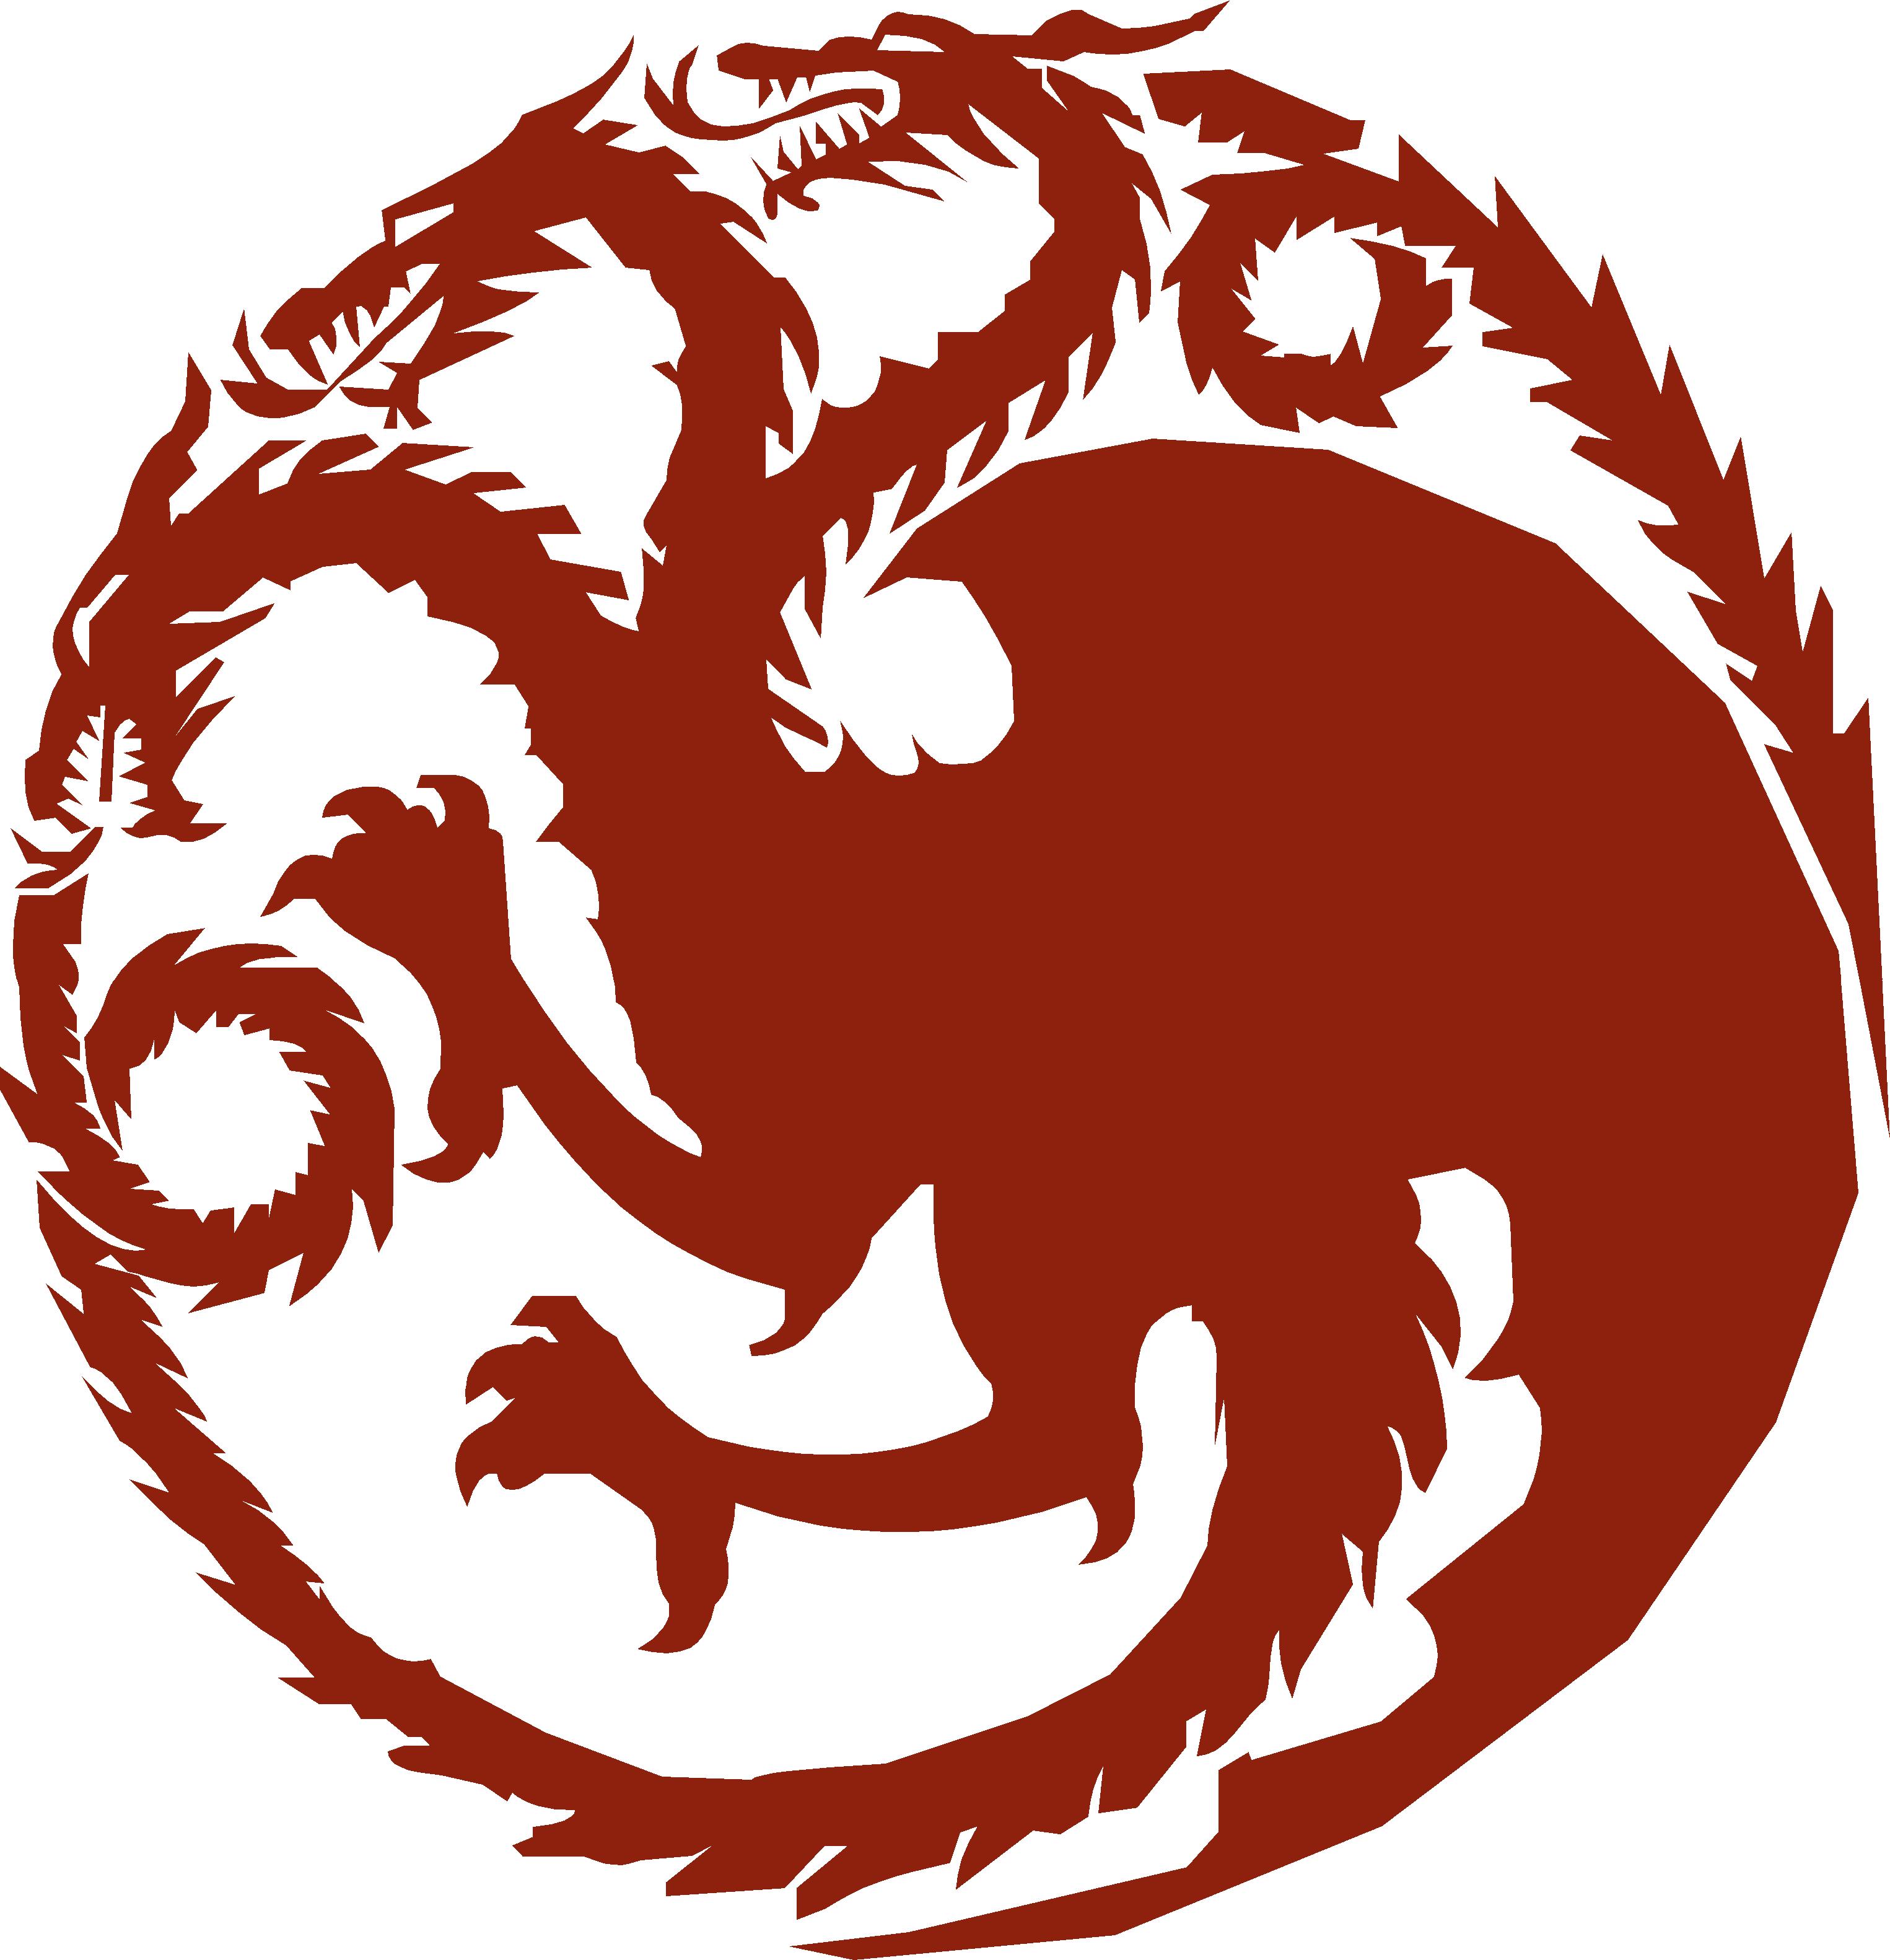 snQuE77.png (3051×3164) Эскиз дракона, Игра престолов, Эскиз